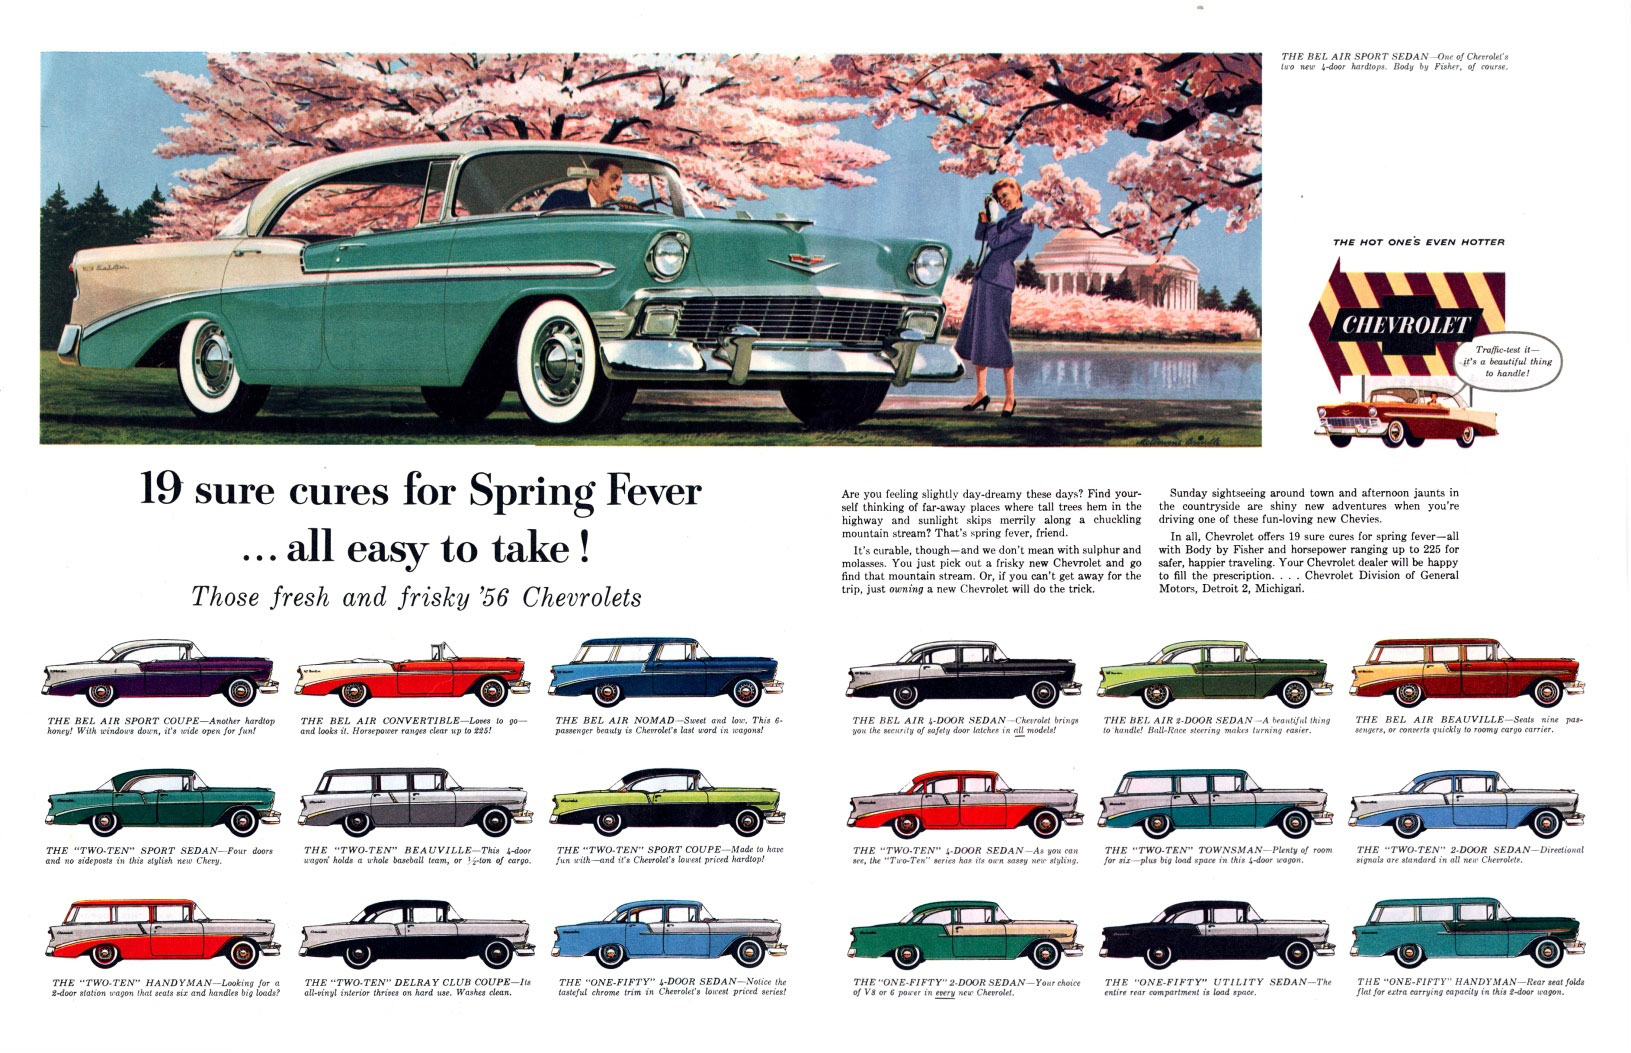 1956-Chevrolet-ad-11a.jpg